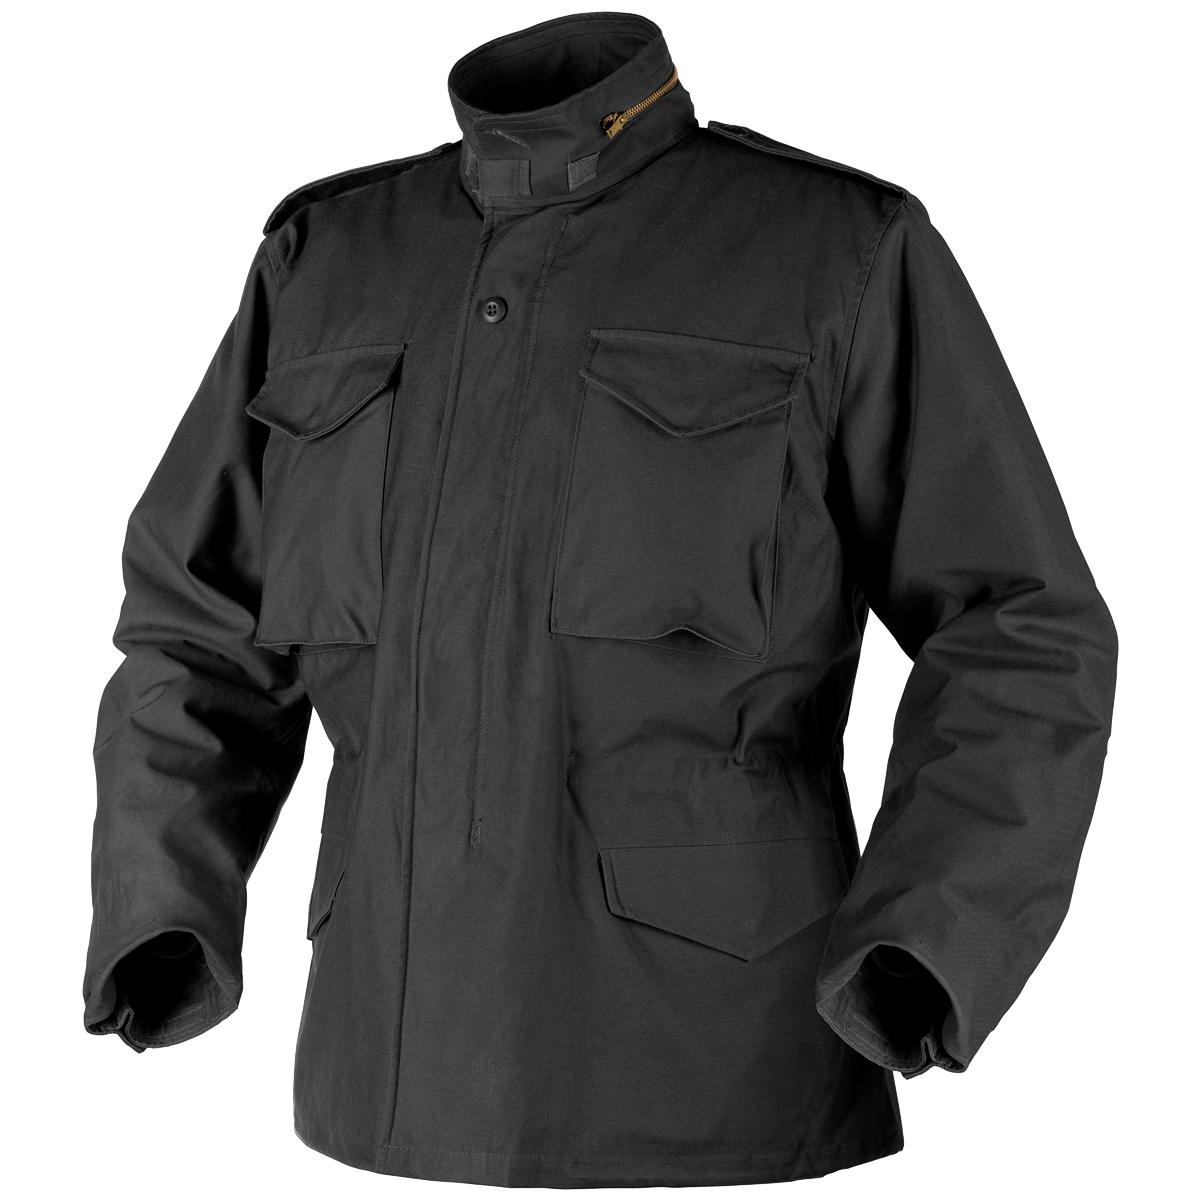 Helikon Genuine M65 Army Field Jacket Military Hooded Coat